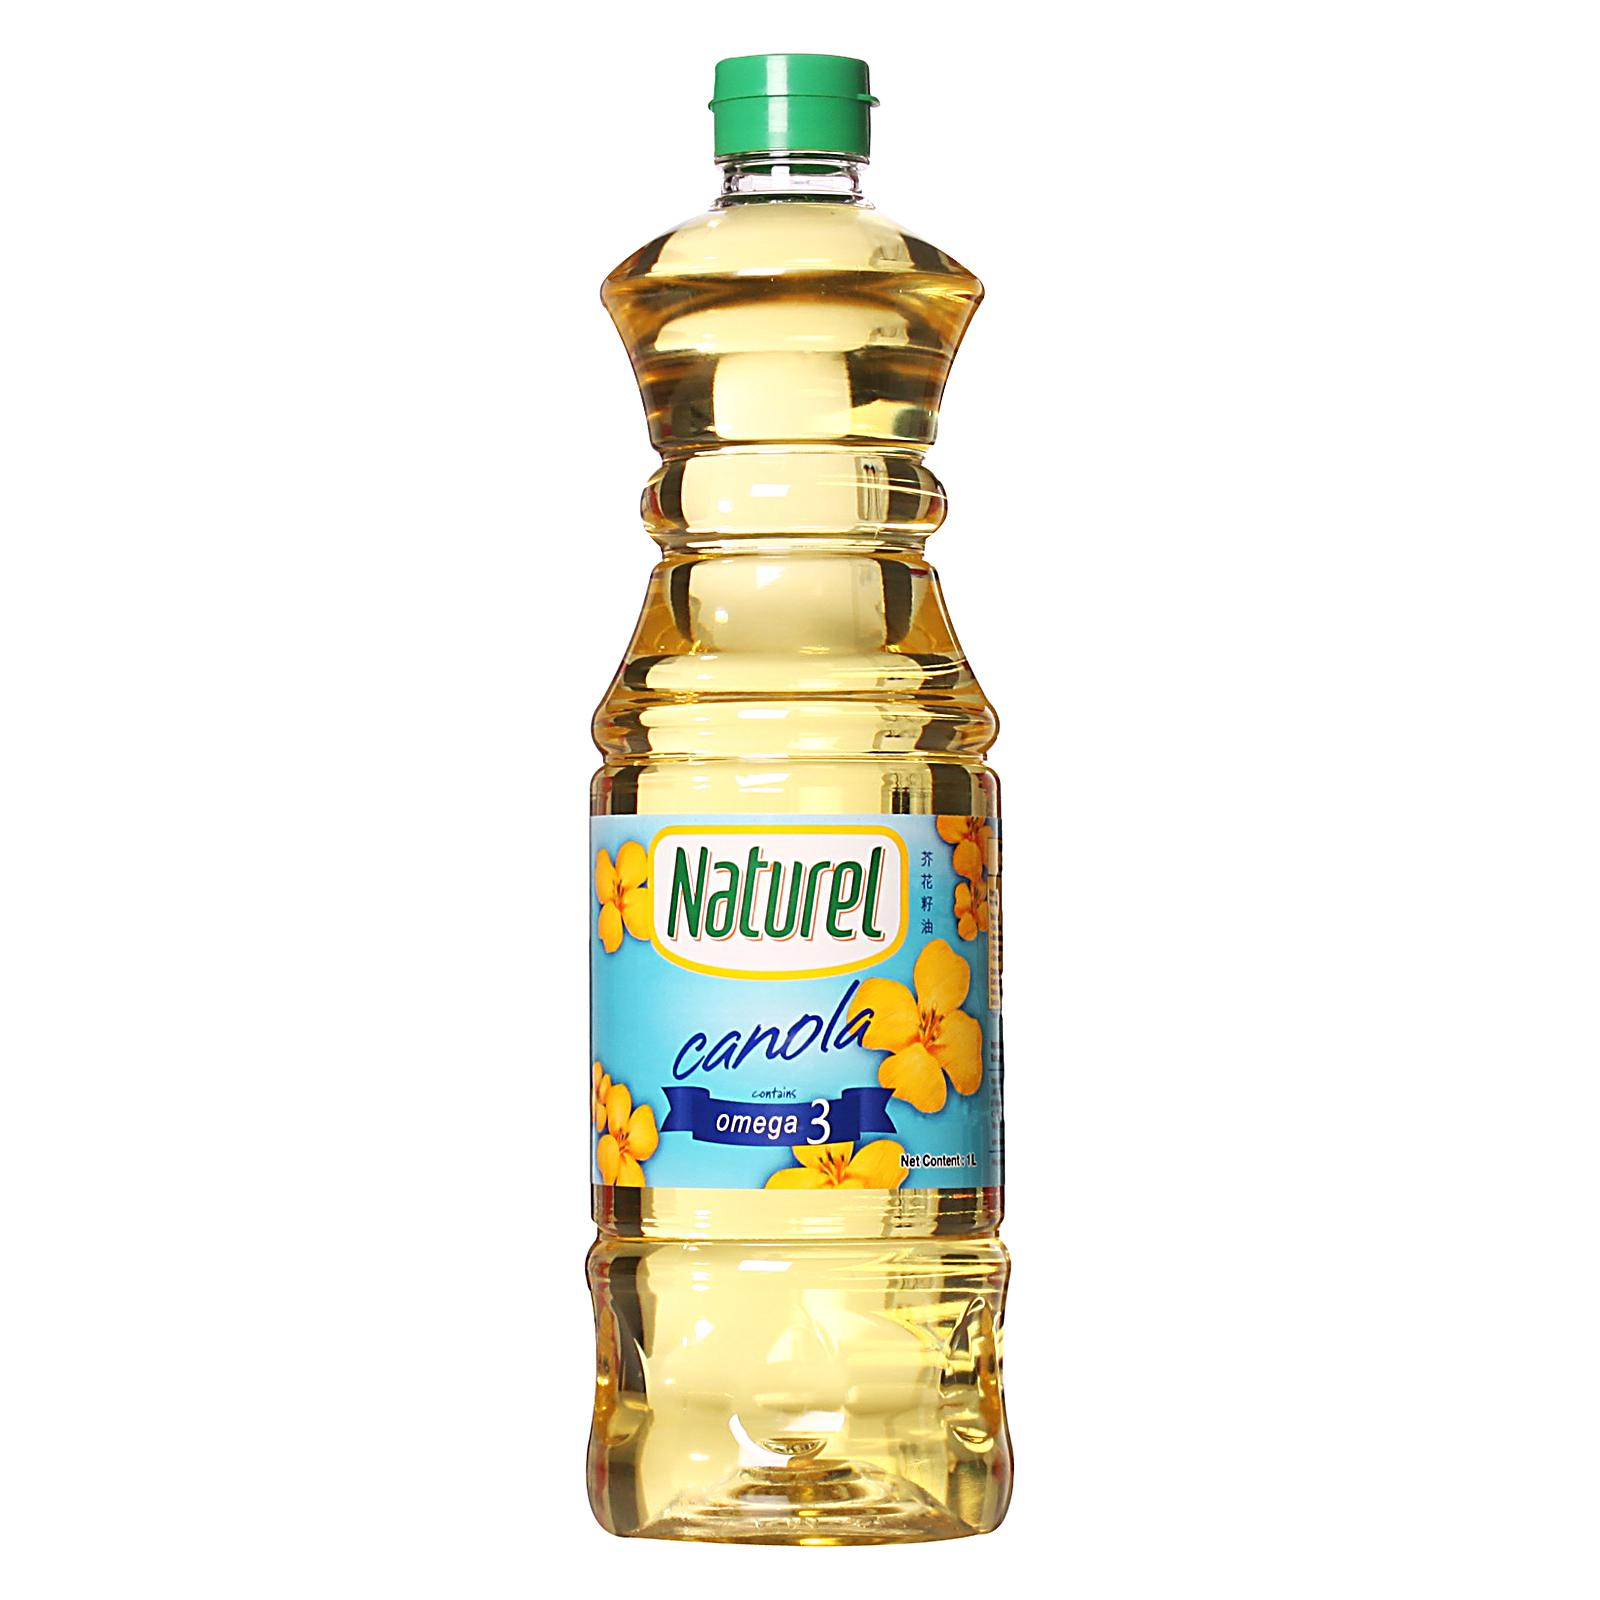 NATUREL Canola Oil 1L